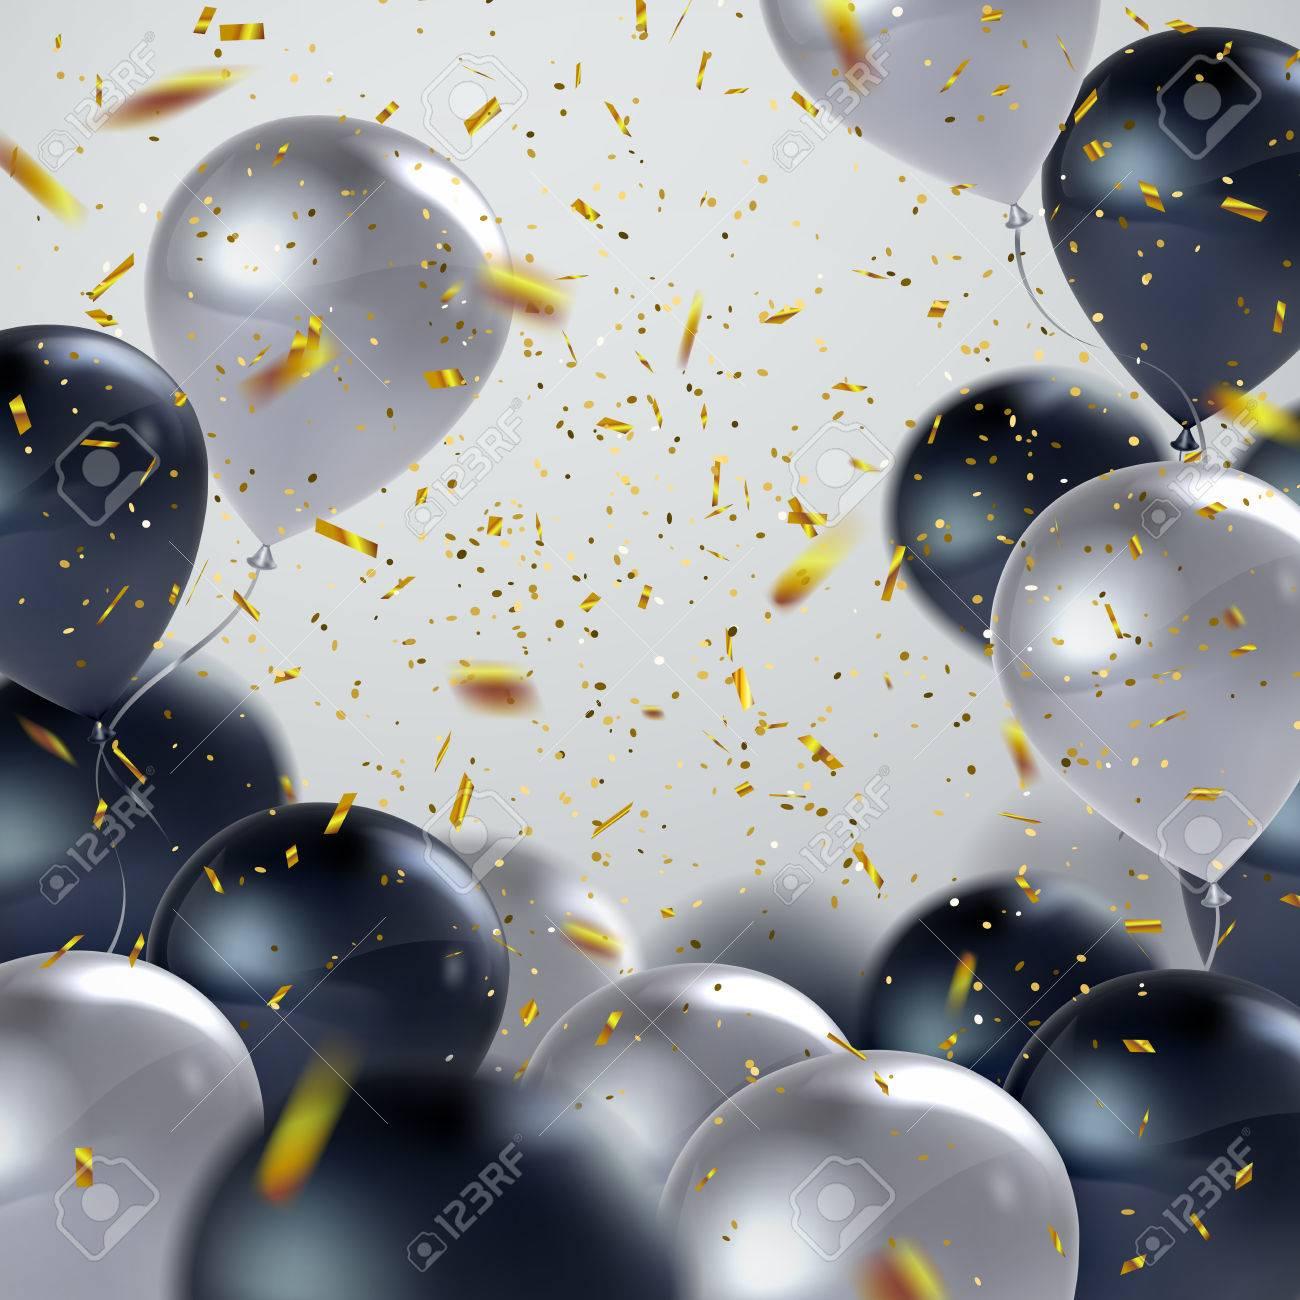 Realistic glossy balloons - 71079454